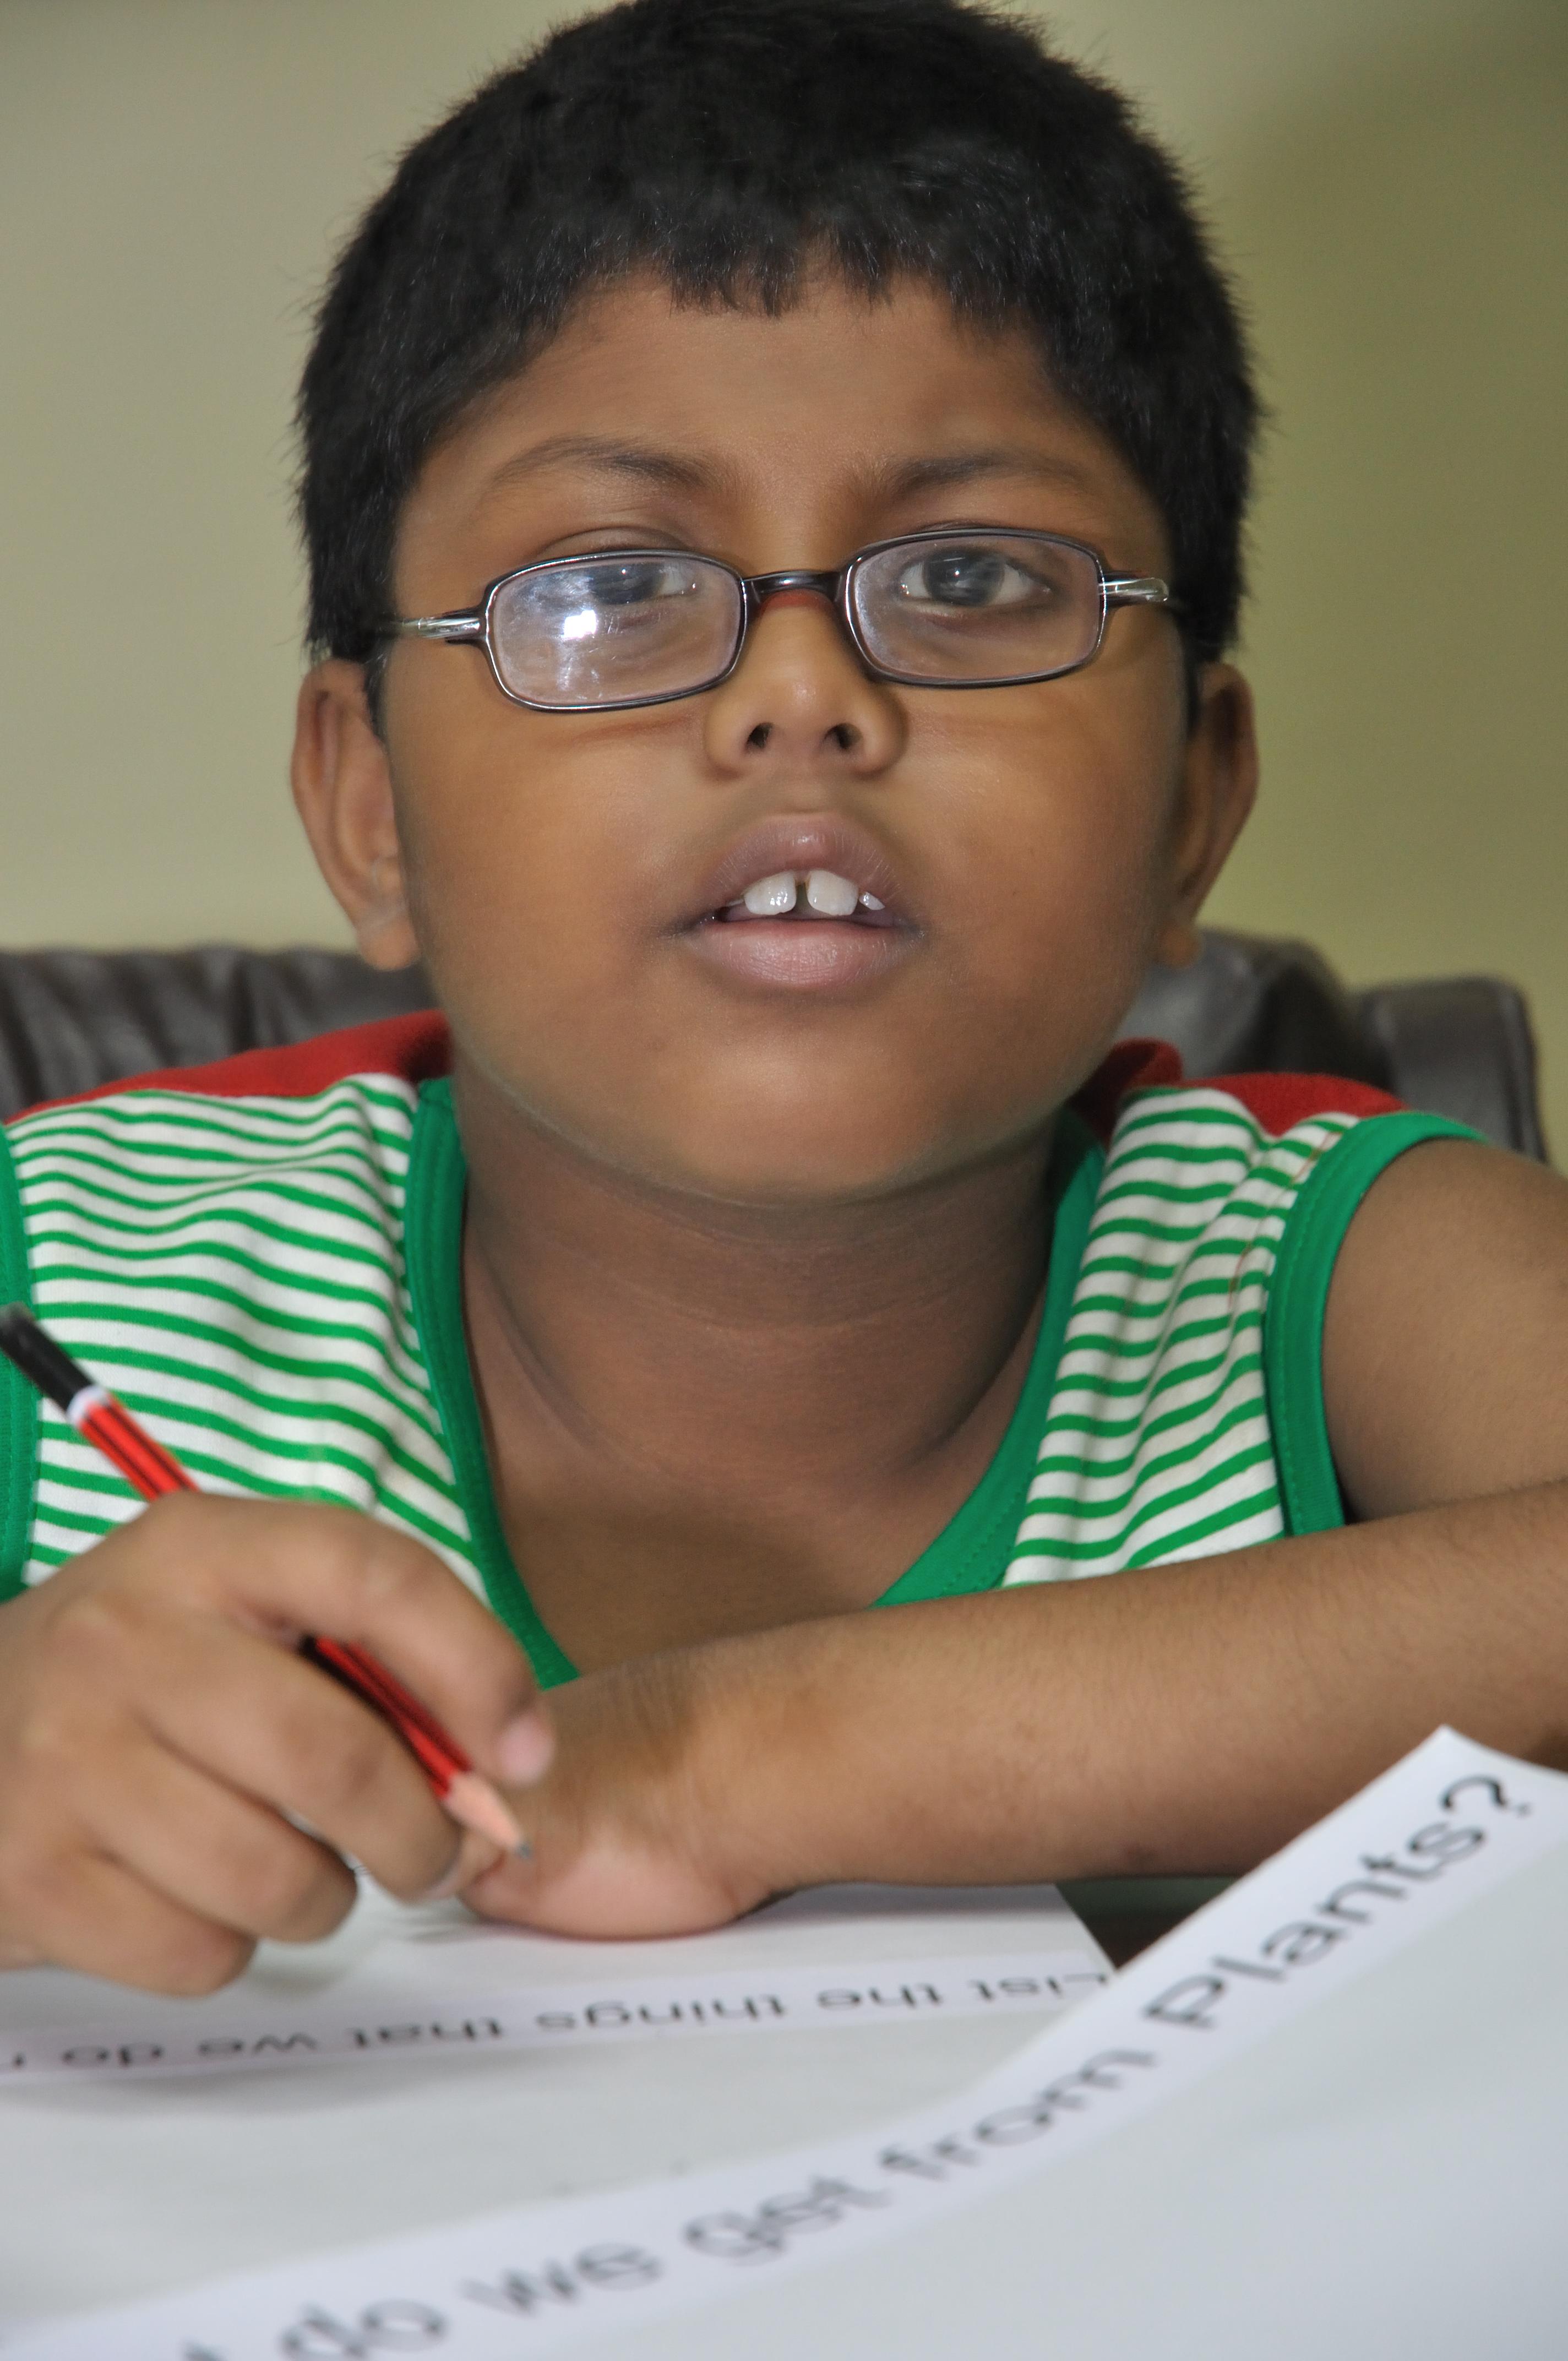 Description Indian Boy Child 4975.JPG